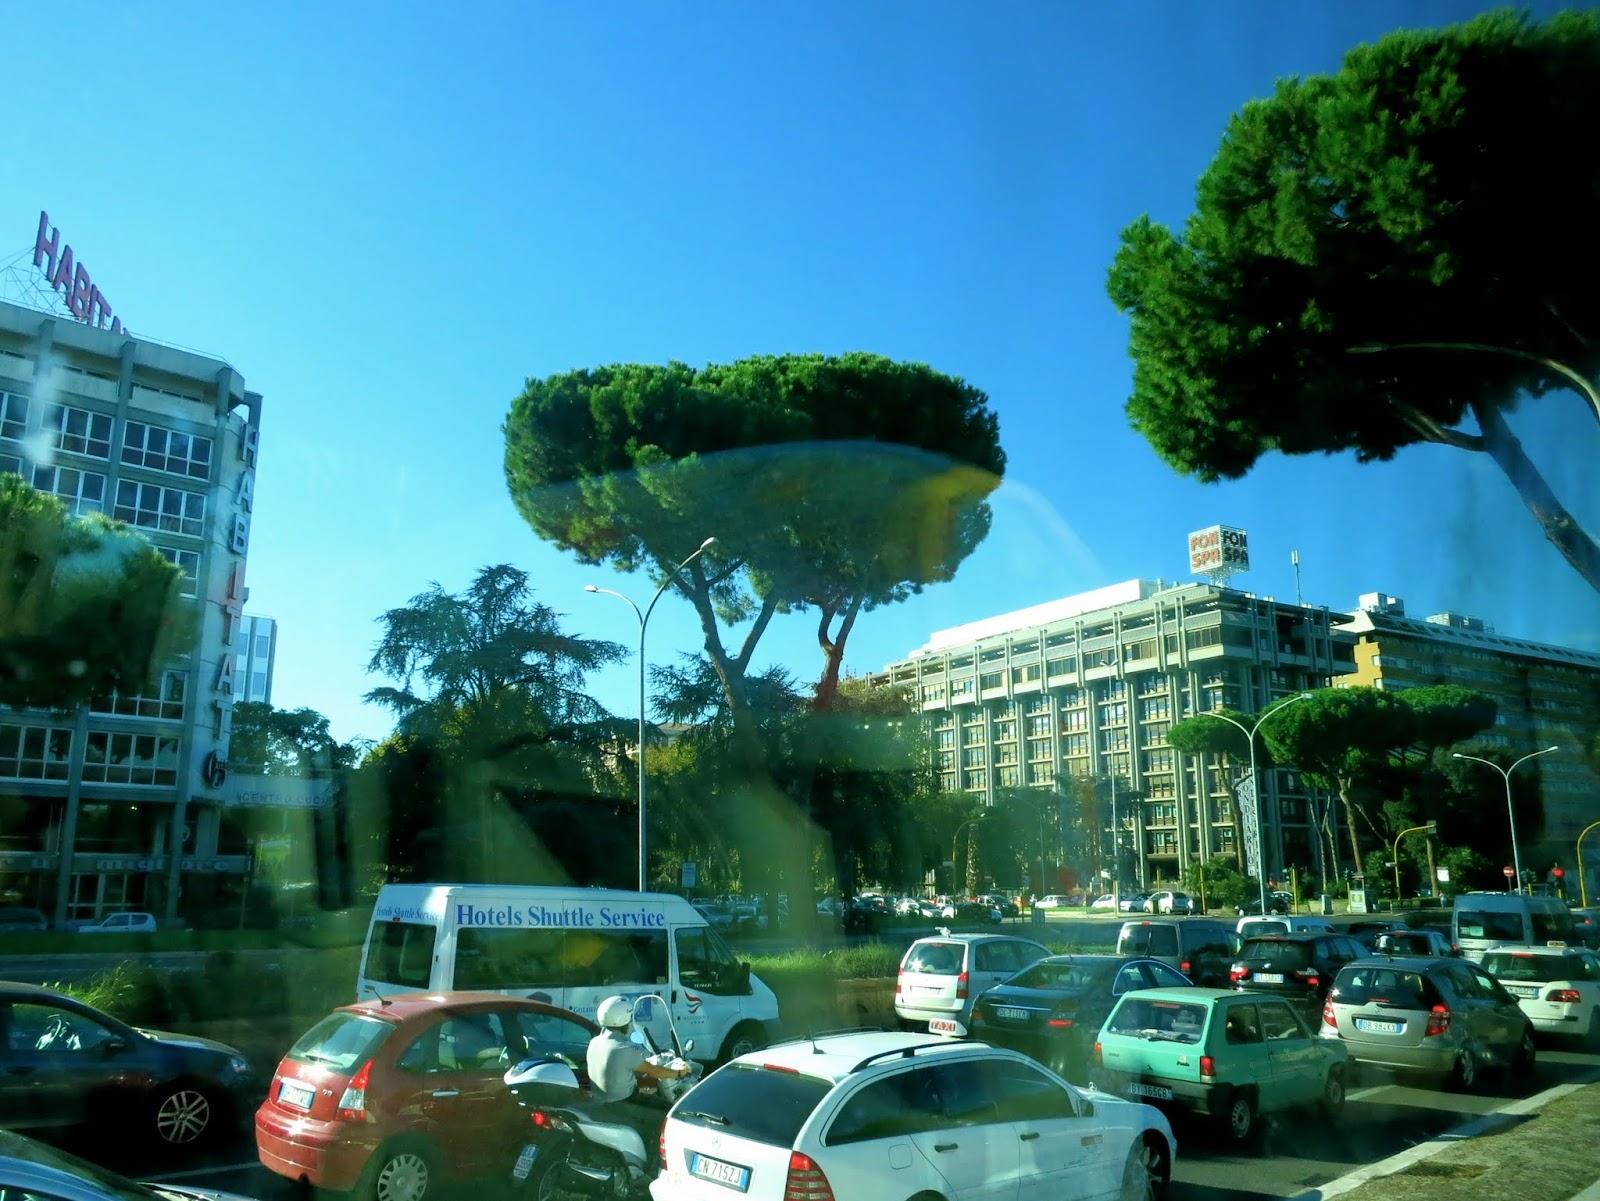 Rome Traffic Jam